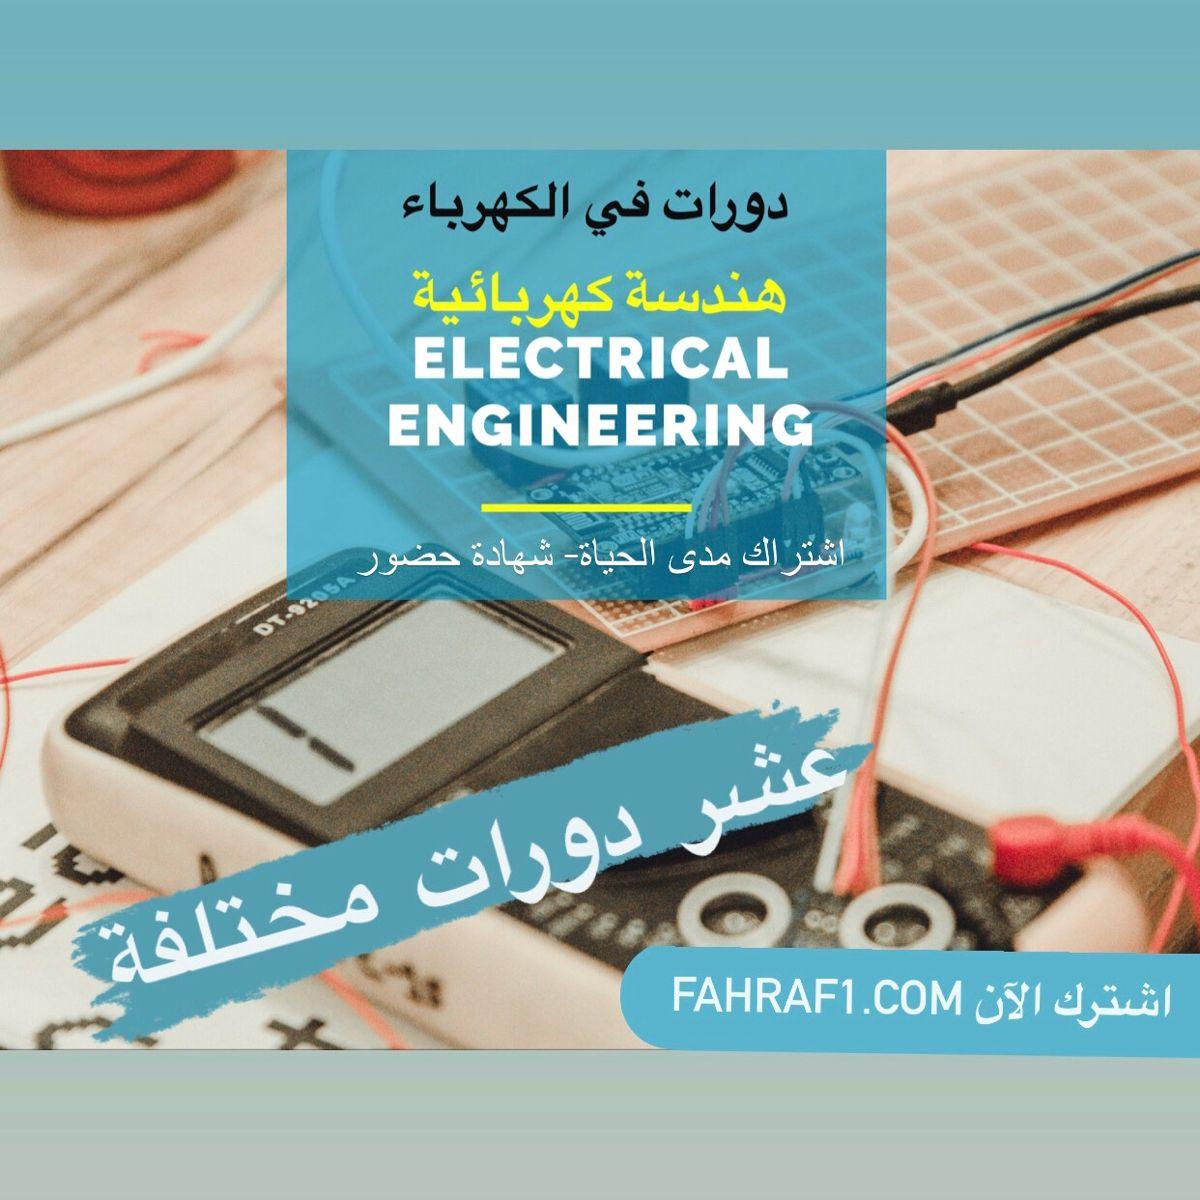 دورات كهرباء Electronic Engineering Engineering Electrical Engineering